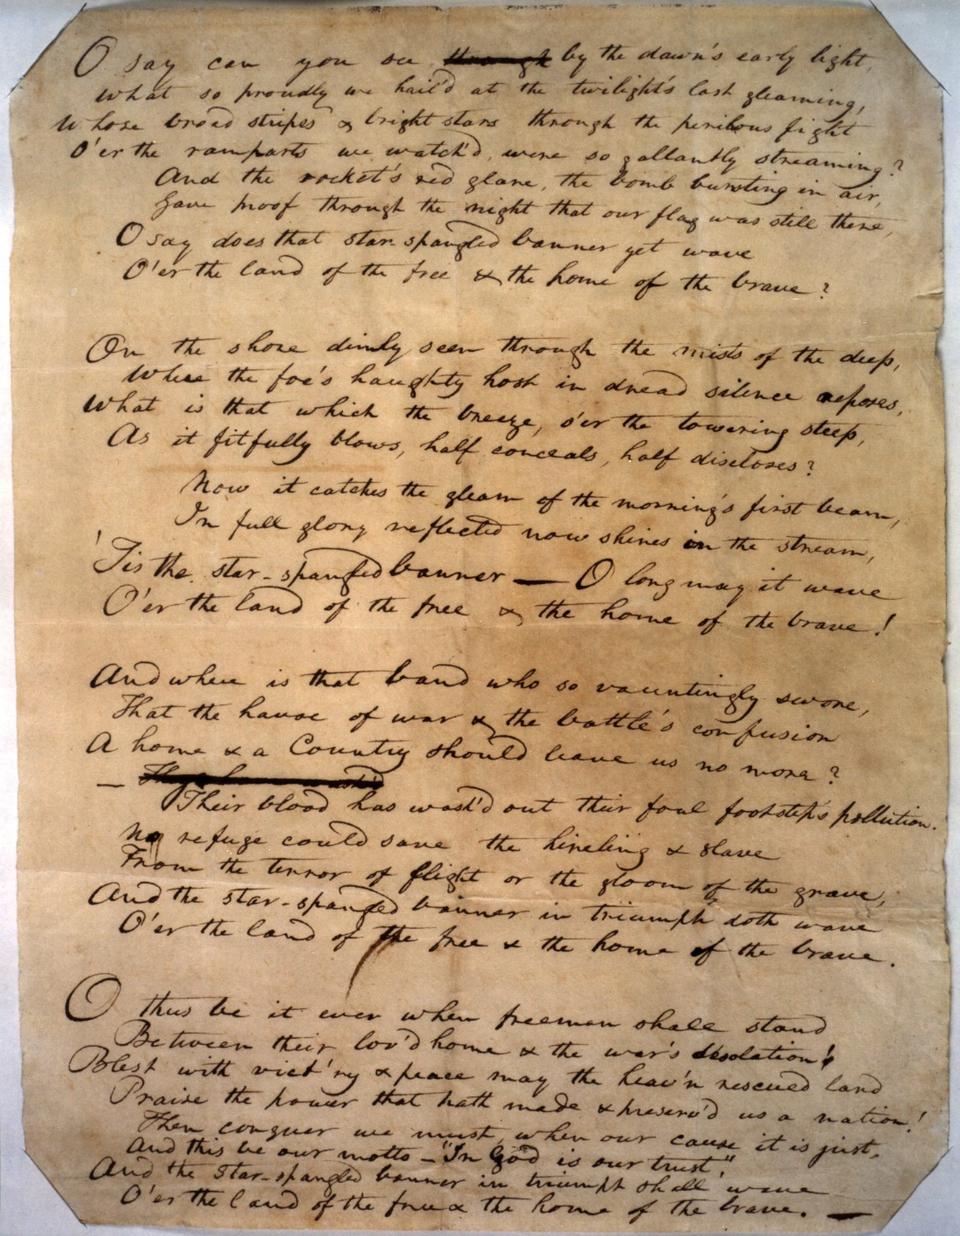 Francis Scott Key's handwriting